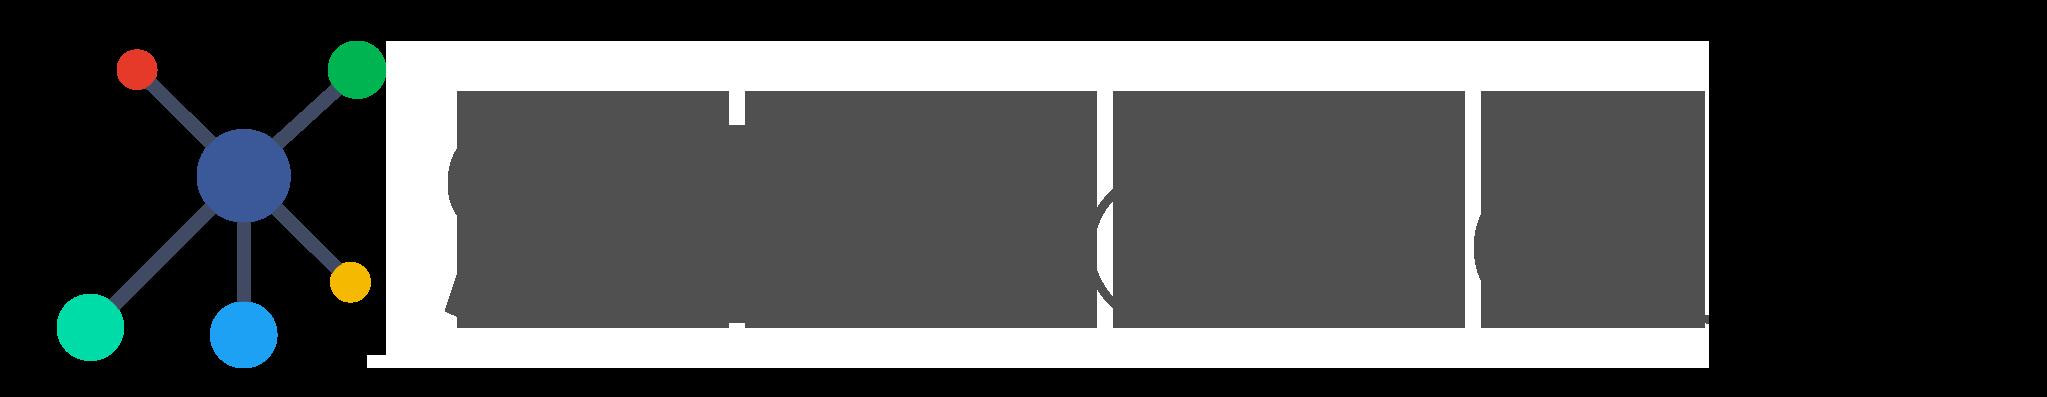 SNSSocial